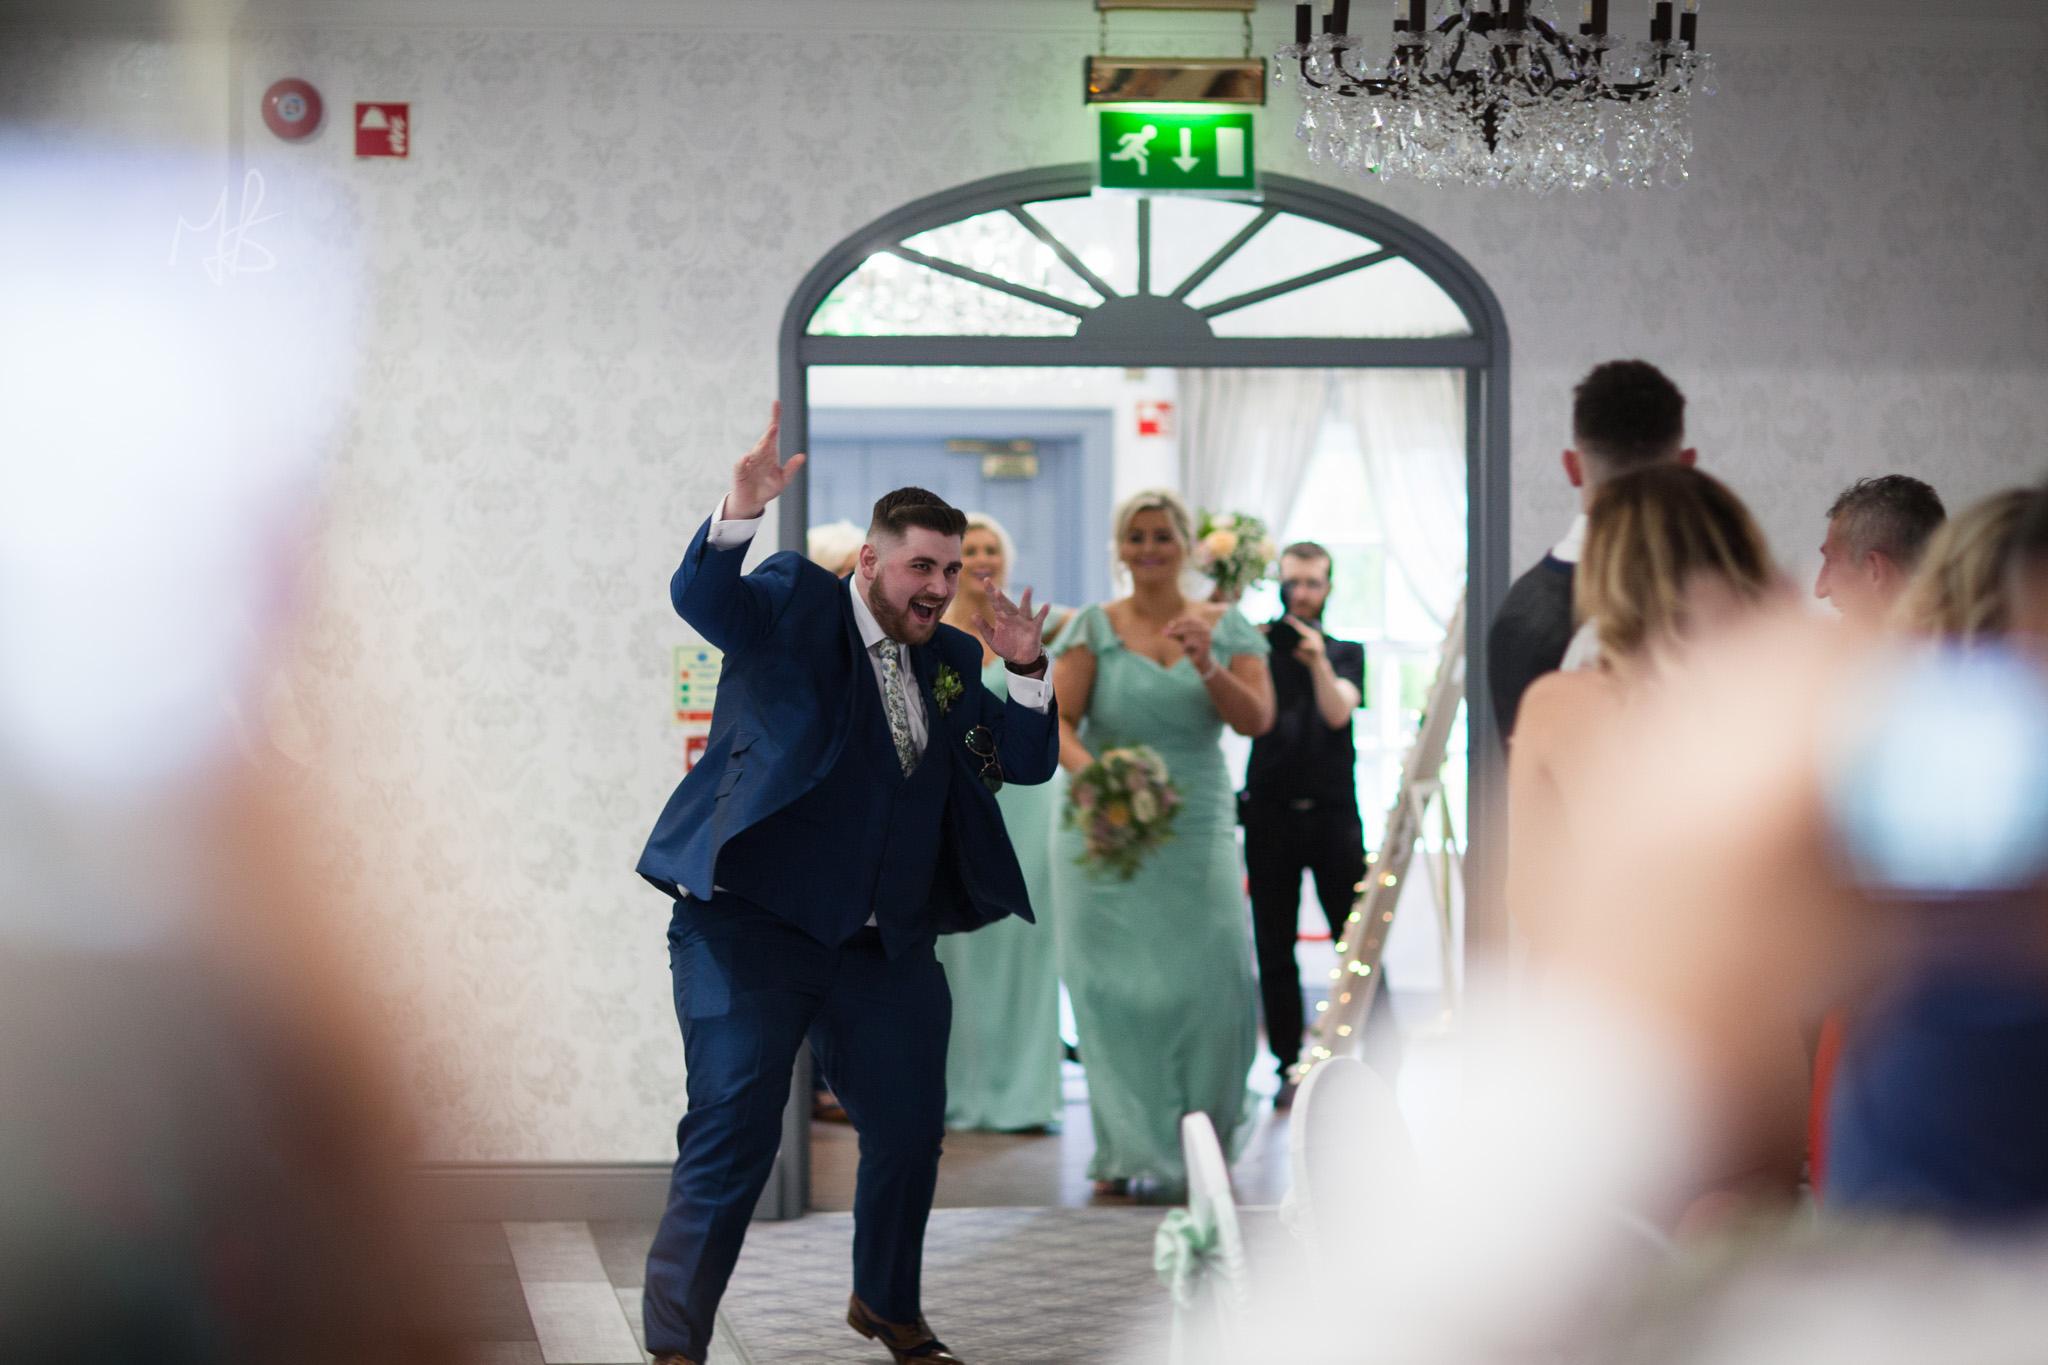 Northern-Ireland-Wedding-Photographer-Mark-Barnes-Ballymena_wedding-photography-Leighinmohr-House-Seamas_Alanna_For-web-39.jpg